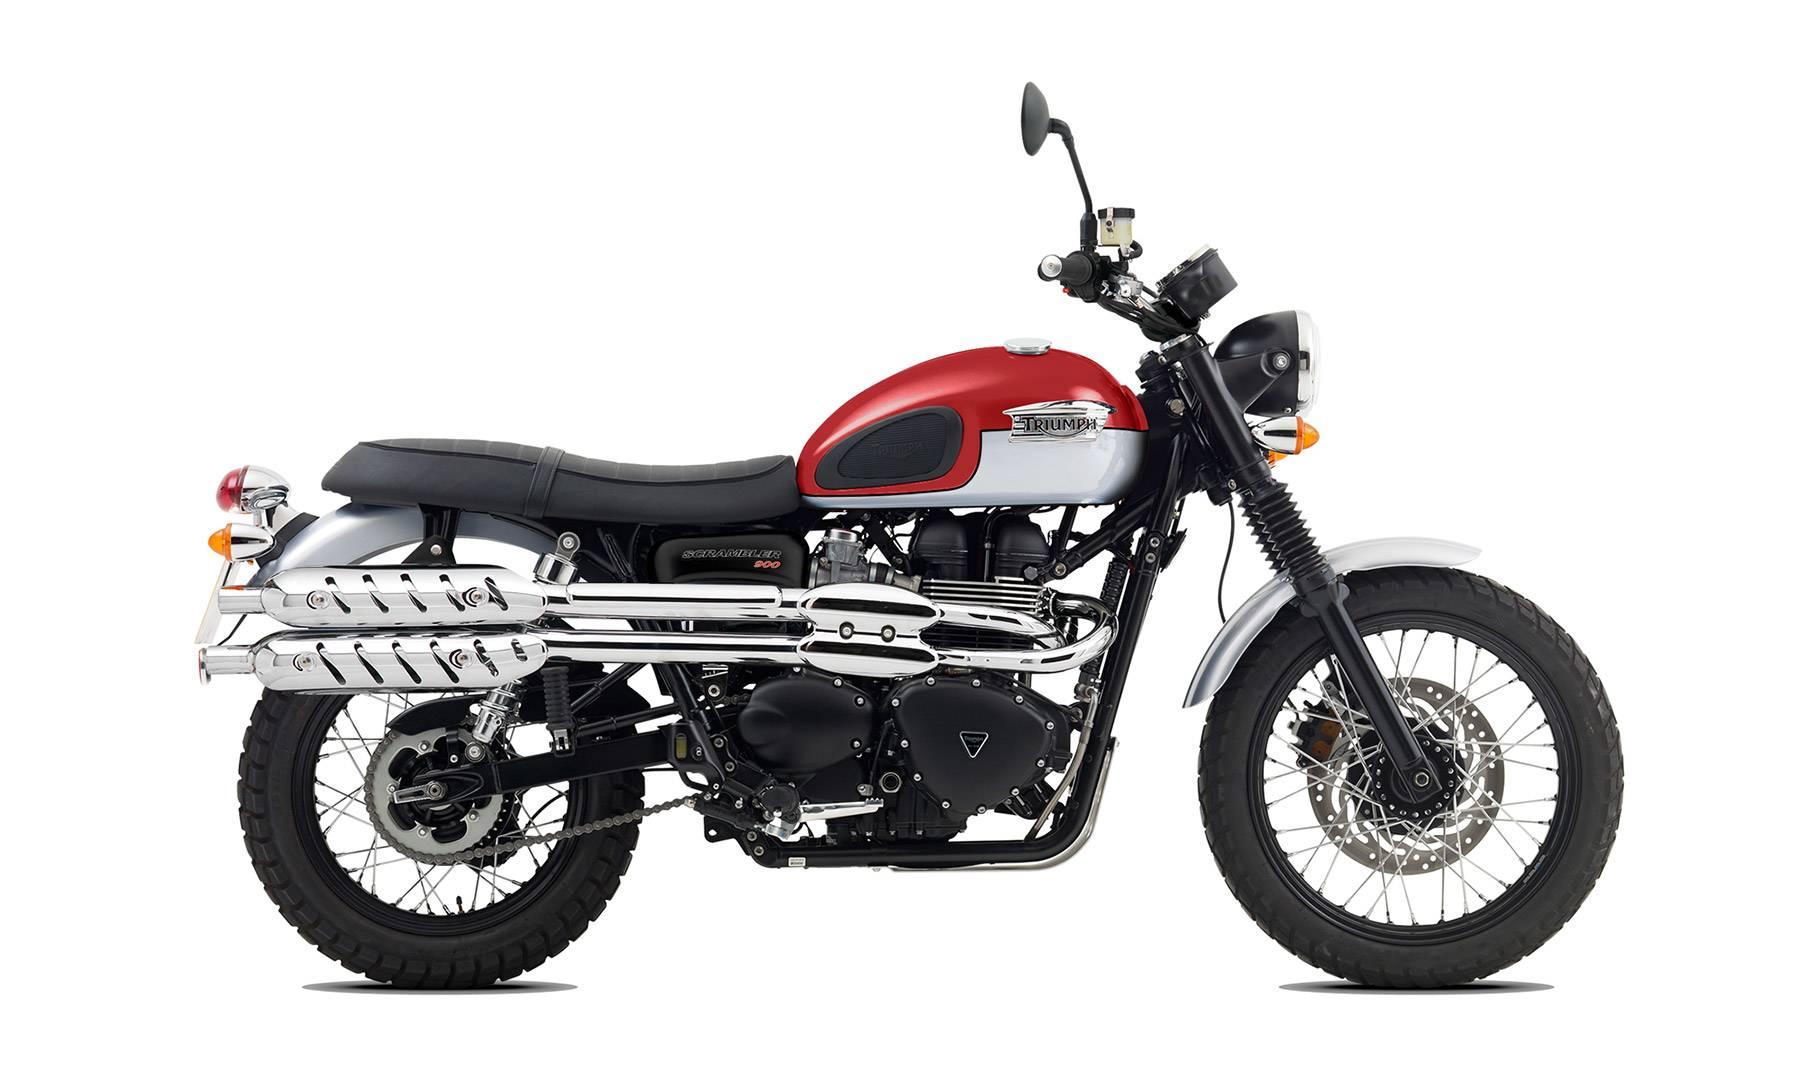 https://s3-eu-west-1.amazonaws.com/cdn.motorbikemag.es/wp-content/uploads/2015/12/Triumph-Scrambler-Estudio.jpg